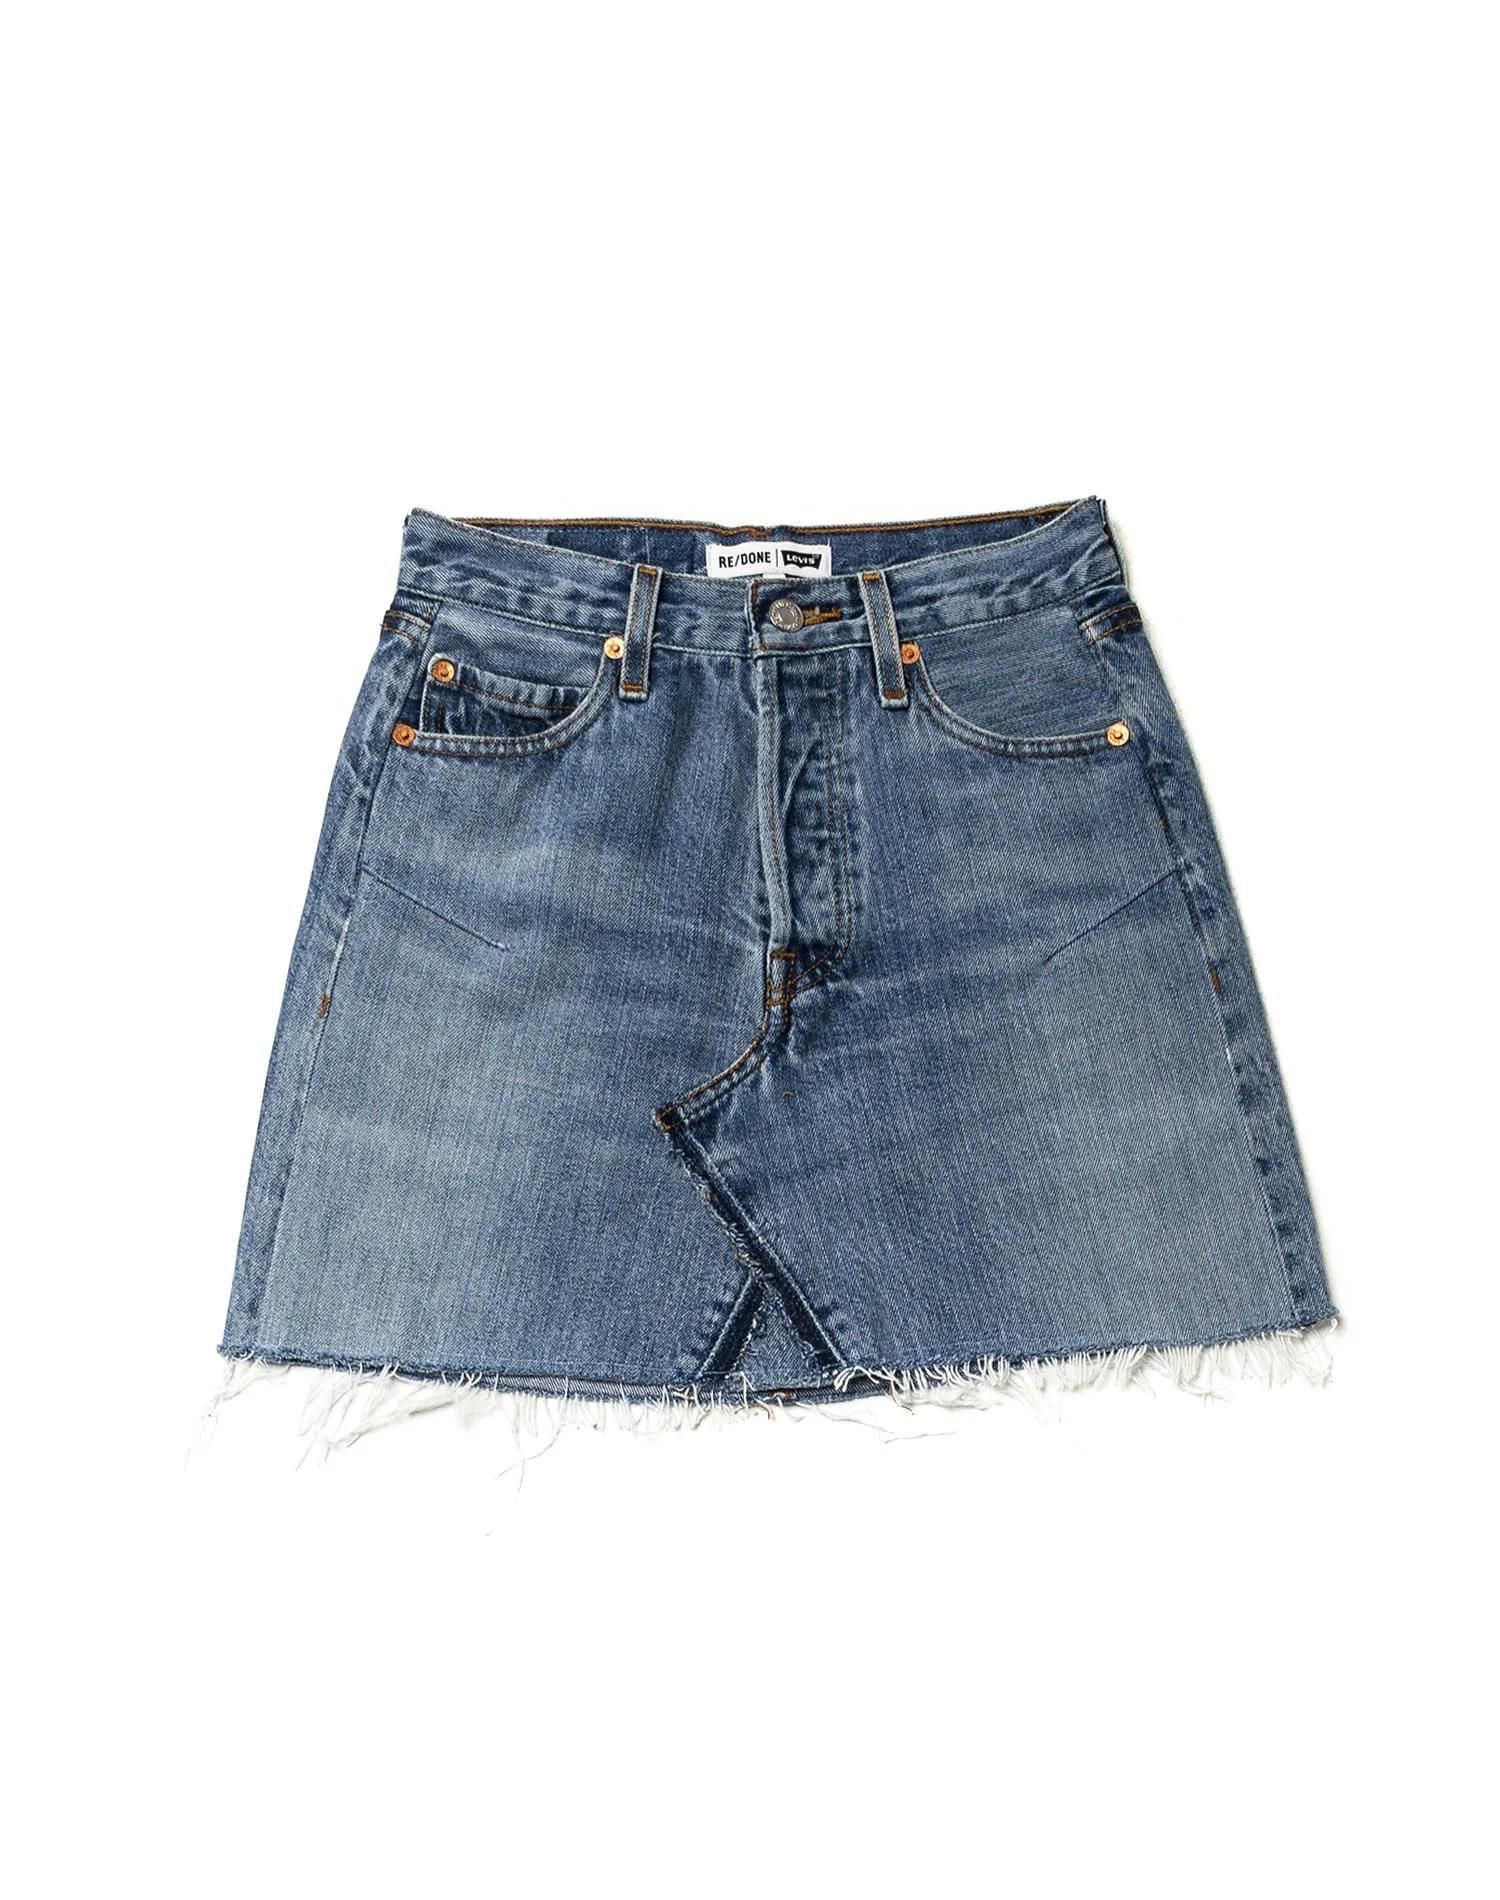 Kendall Jenner Wears a ReDone Levis Denim Skirt in New